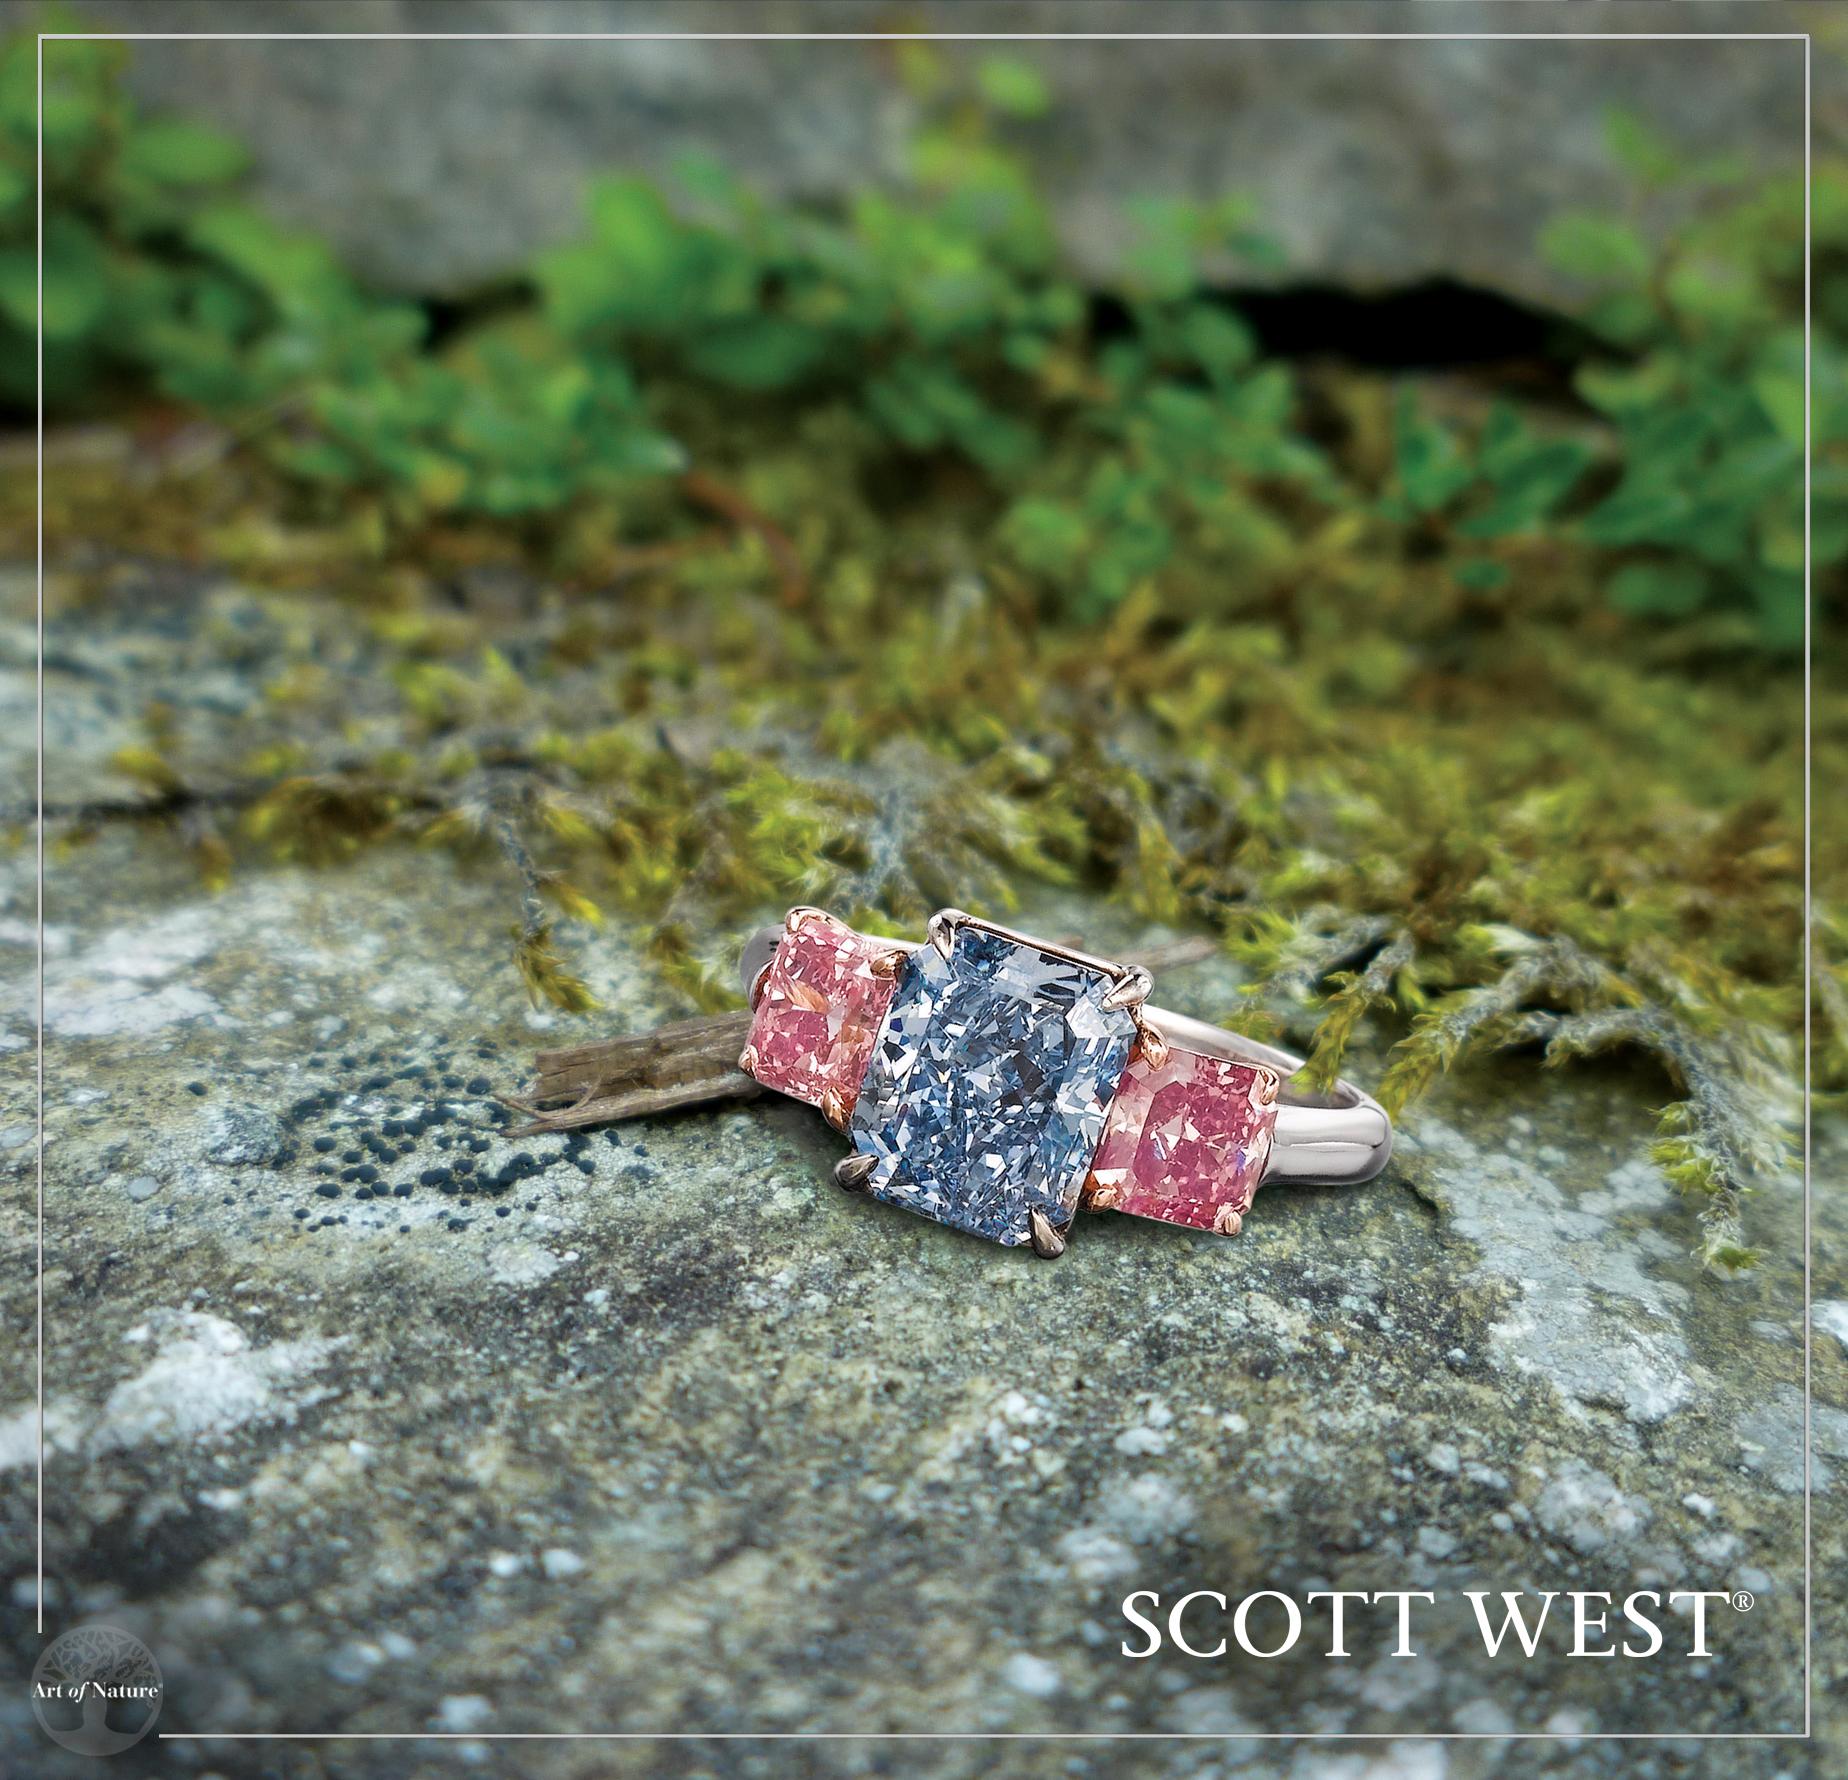 Scott West - Vivid Blue diamond with Pink diamonds    Vivid Blue Radiant, 3 ct Vivid and Intense Pink side stones, 0.78 ct & 0.68 ct     Inquire